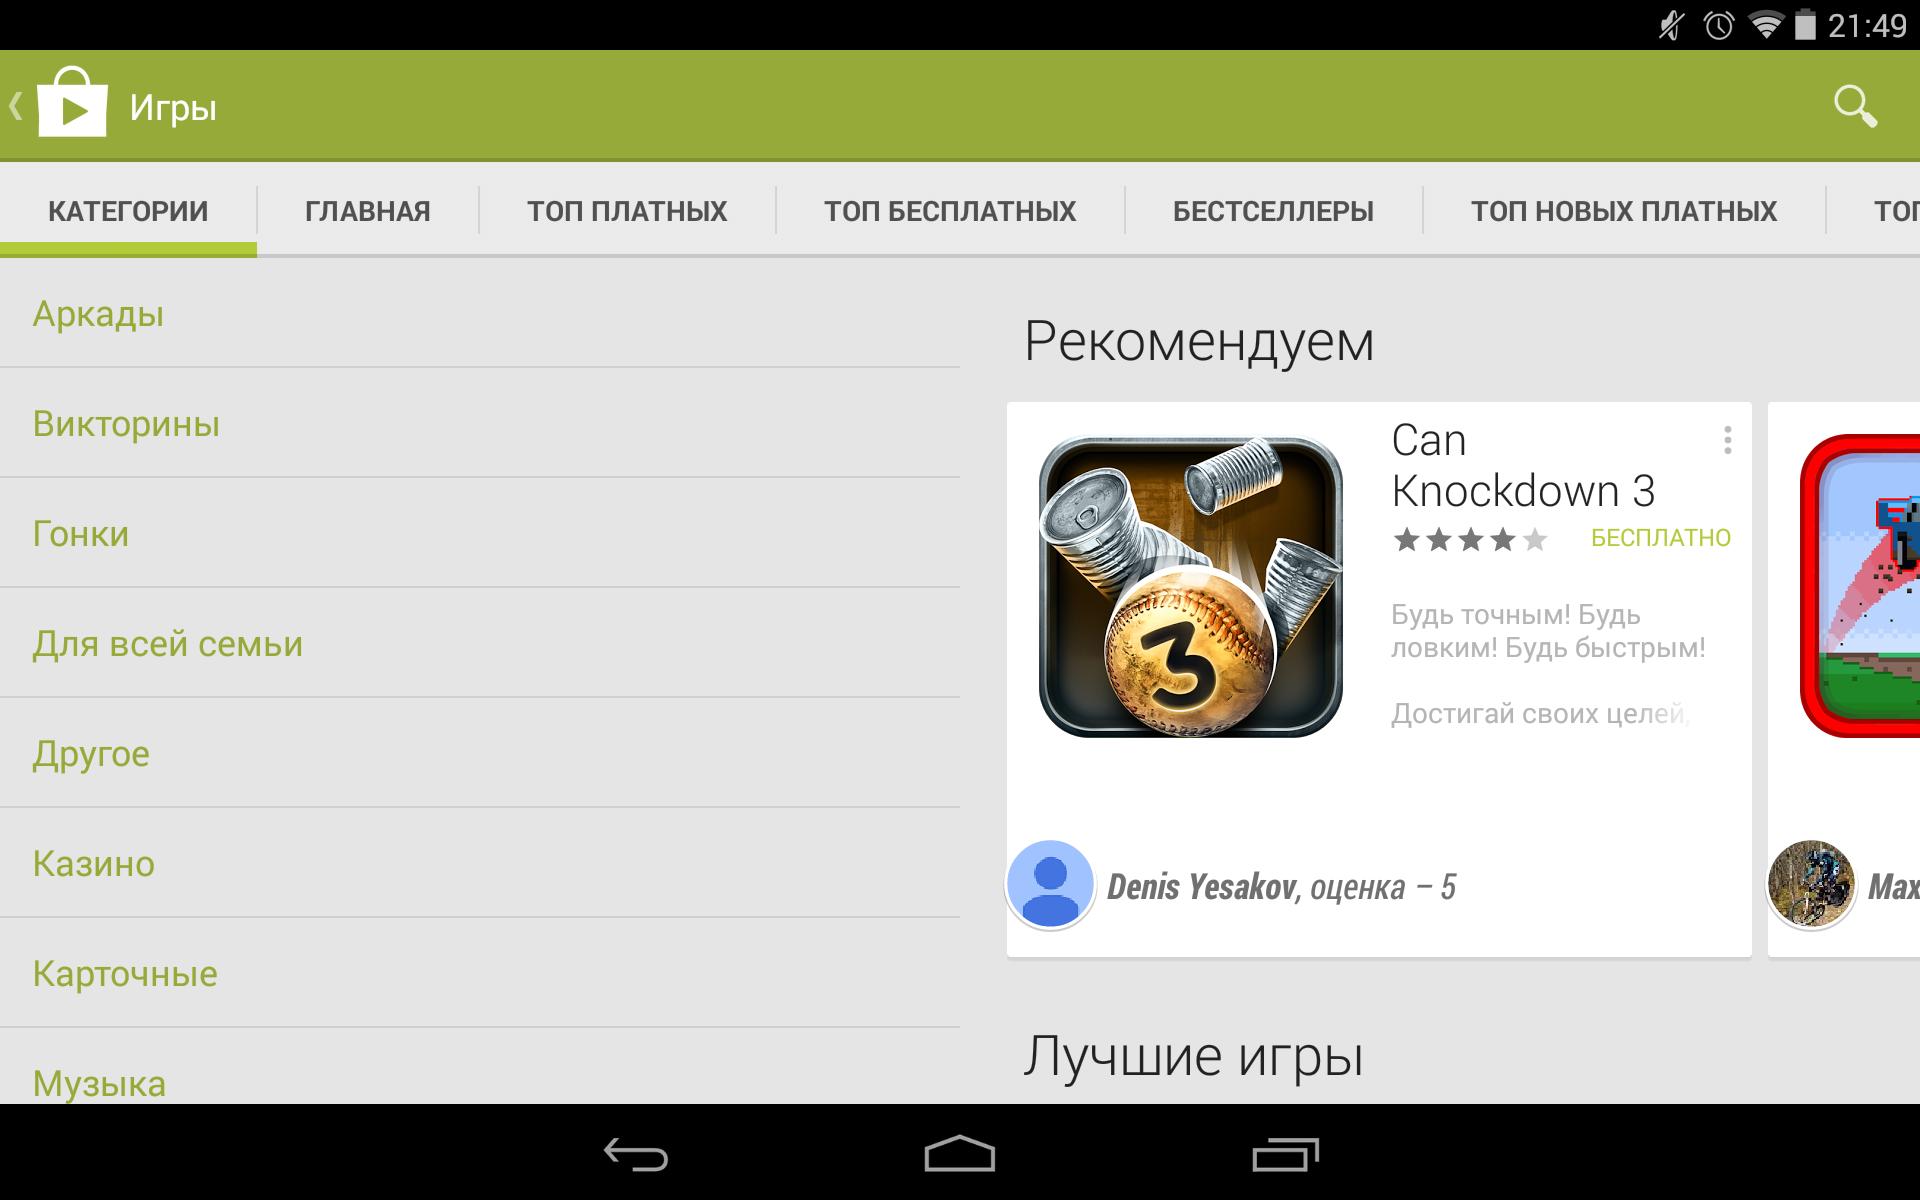 Скачать андроид маркет для андроид 2. 3.